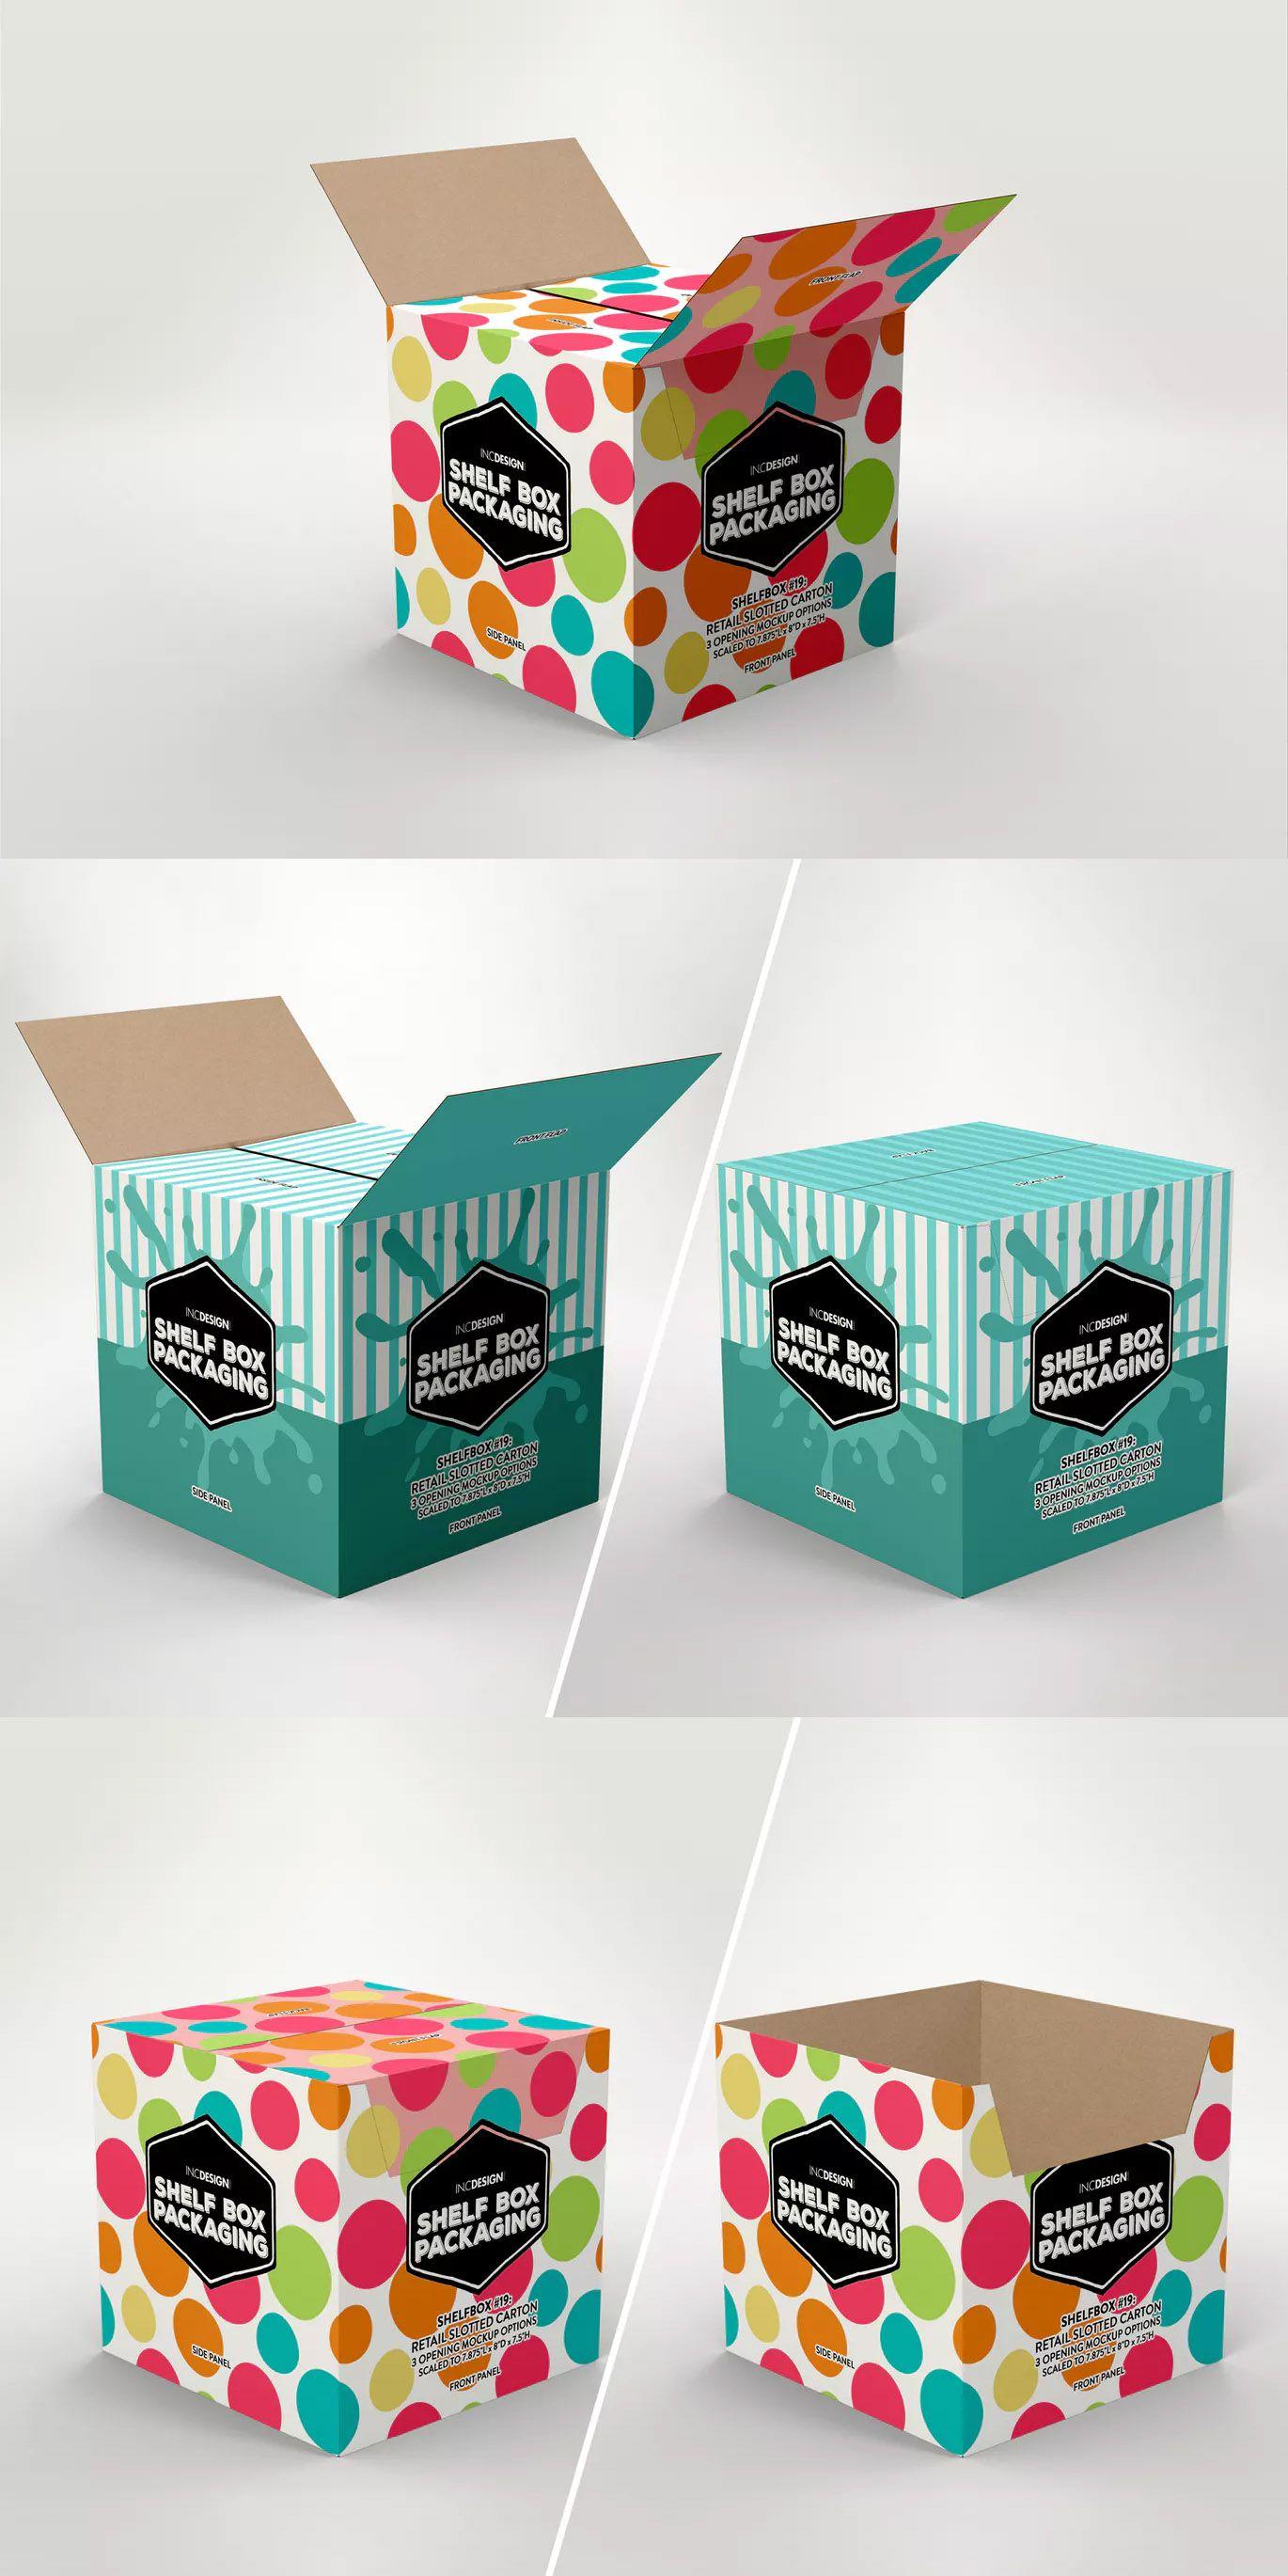 Download Retail Shelf Box 19 Packaging Mockup By Ina717 On Envato Elements Packaging Mockup Retail Shelving Mockup